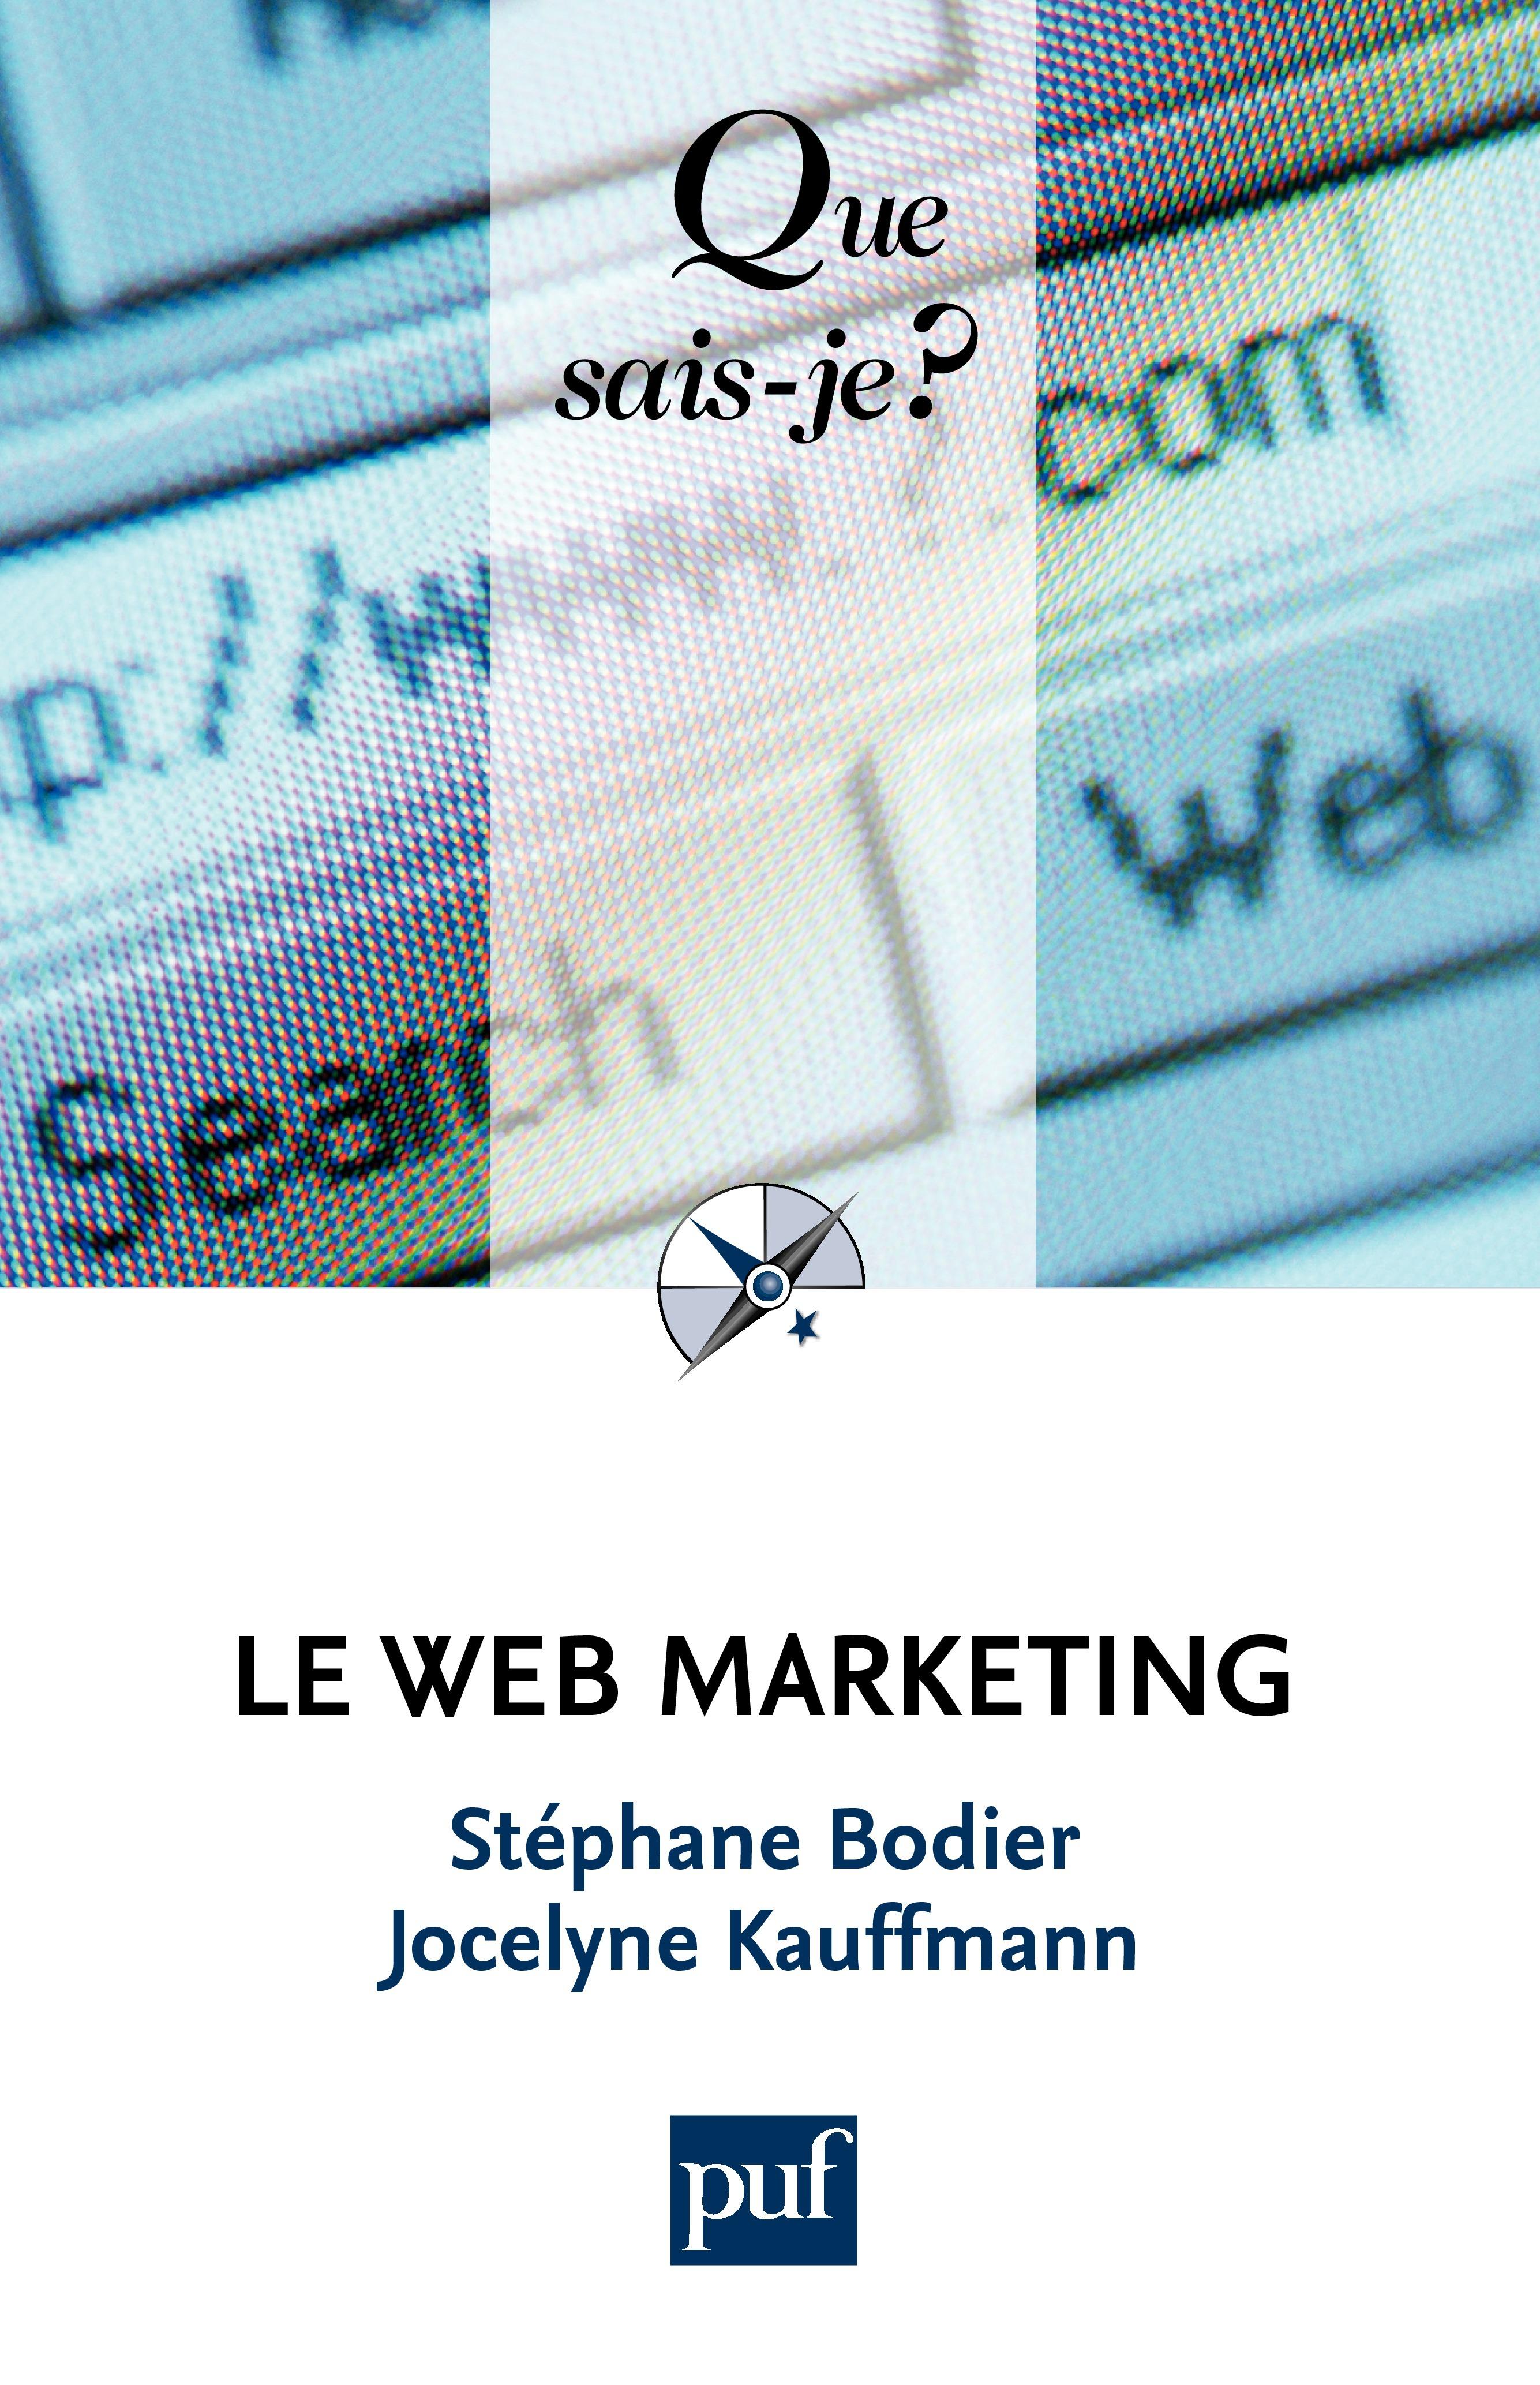 Stéphane Bodier Le web marketing